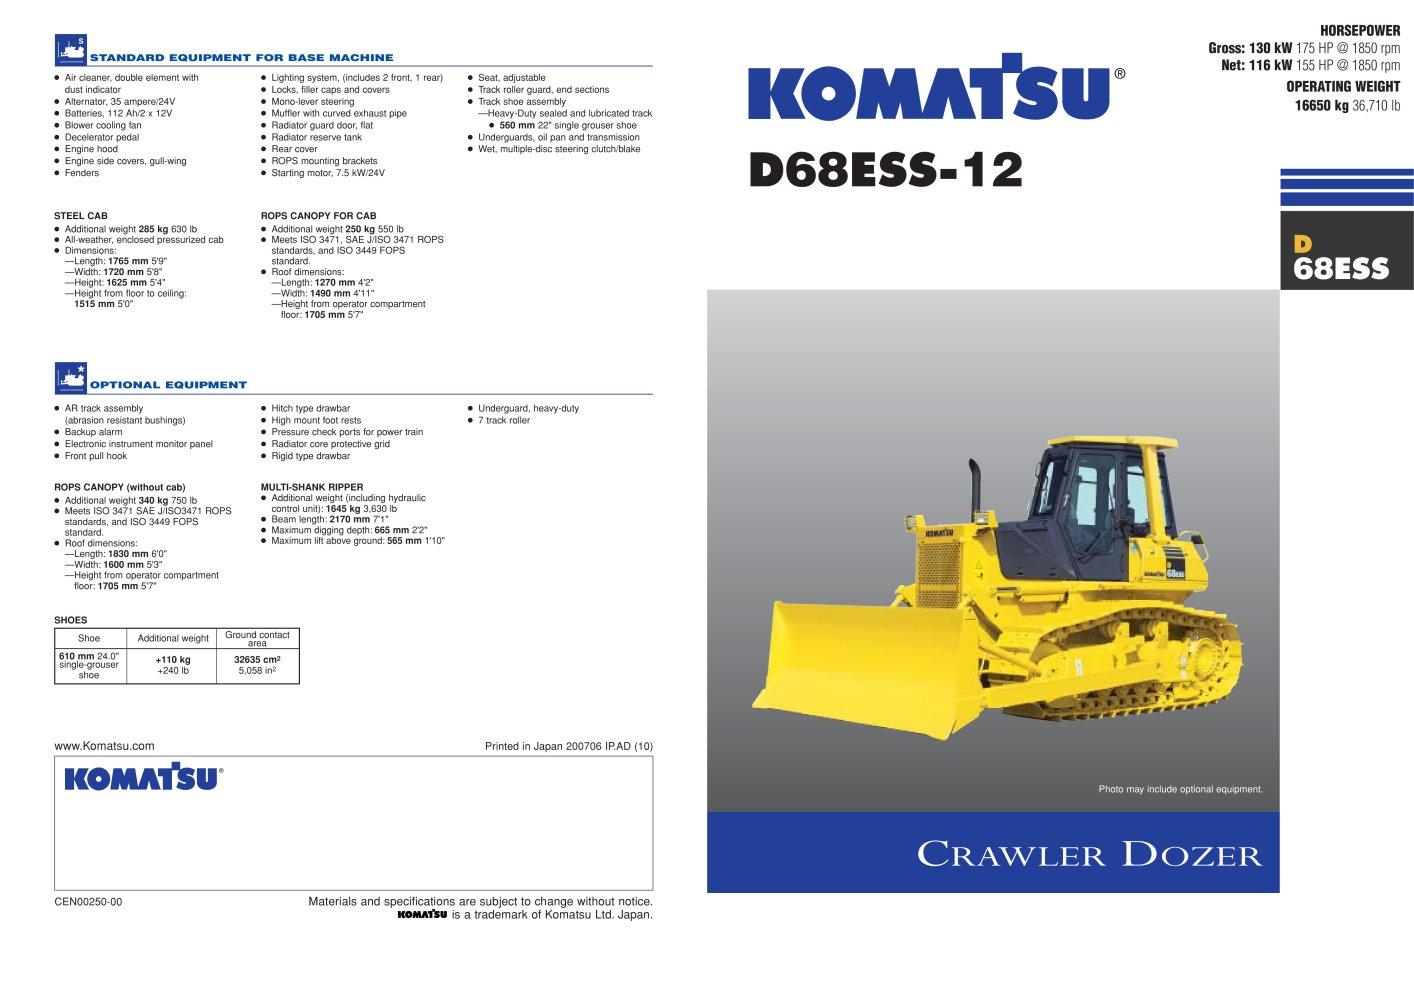 D68ess 12 Komatsu Construction And Mining Equipment Pdf Bushing Ar Kw 1 4 Pages